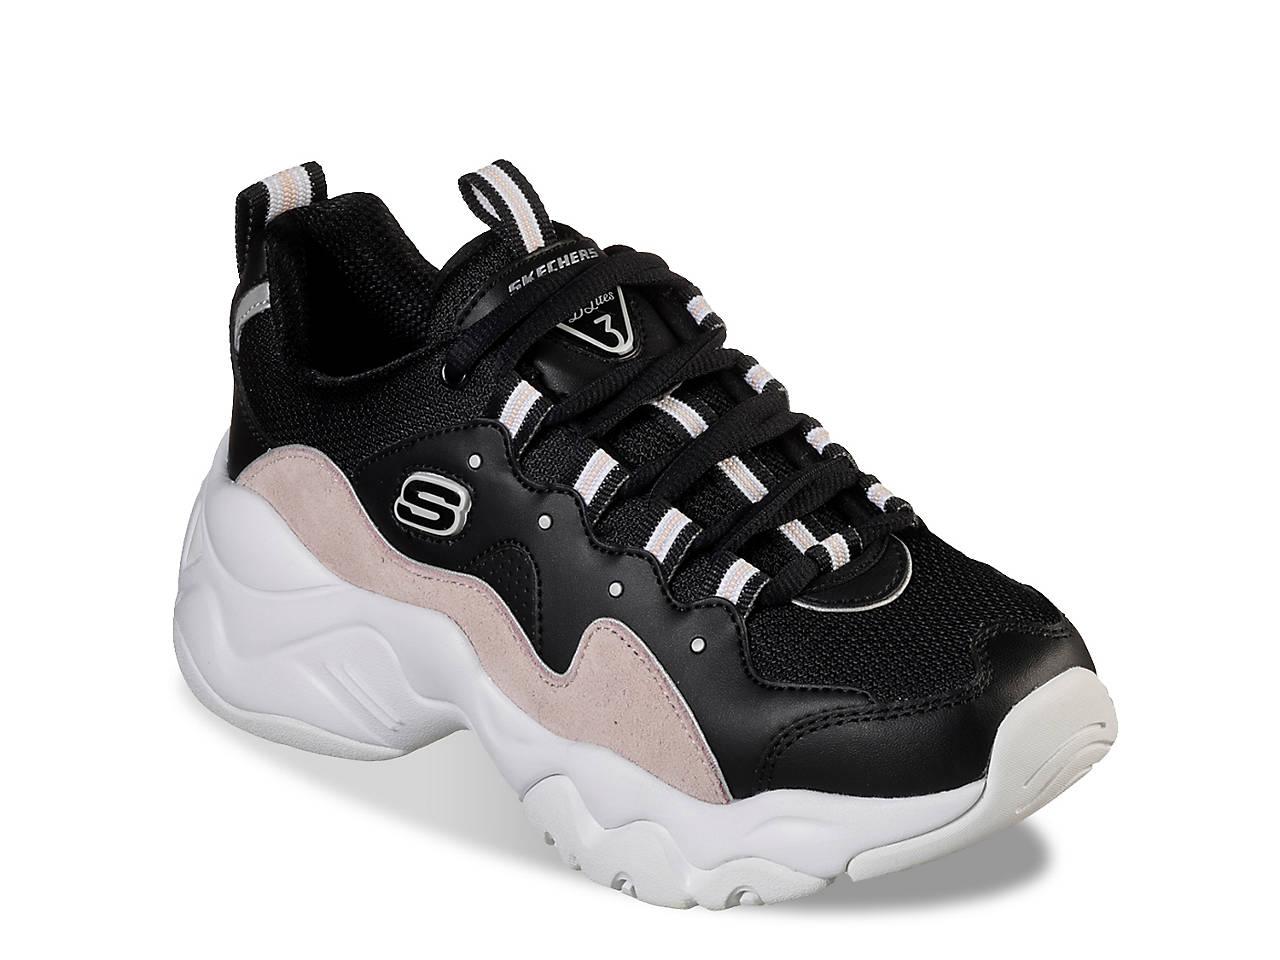 Skechers D Lites Womens Low Sneaker Black | B2B